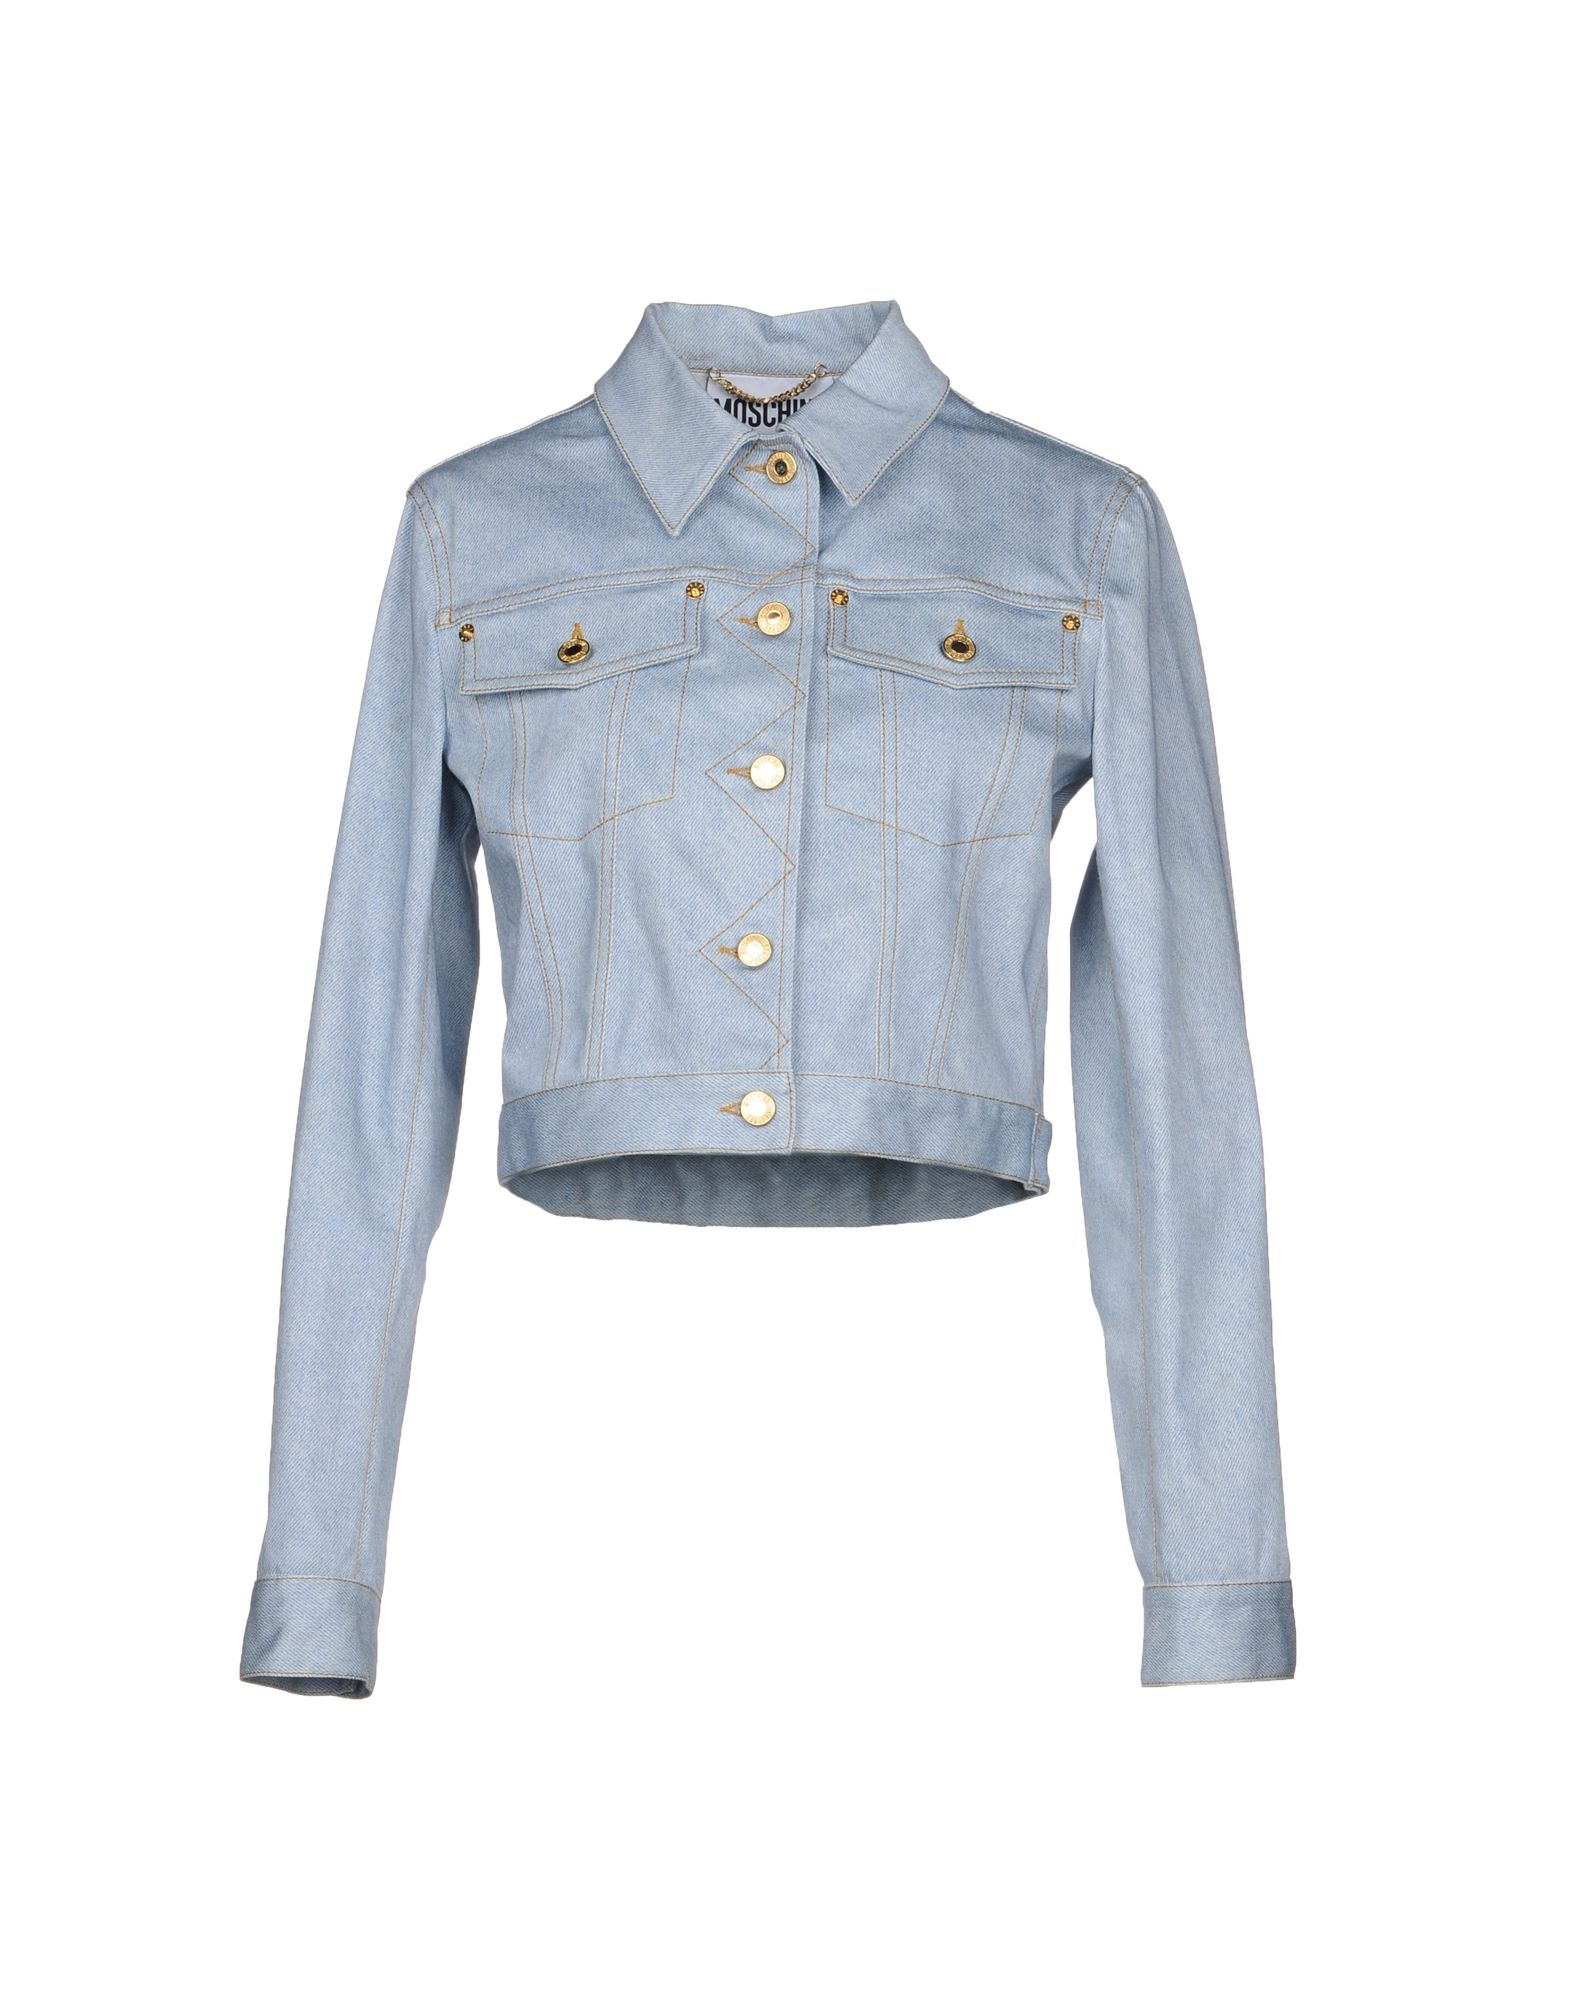 MOSCHINO COUTURE Джинсовая верхняя одежда boutique moschino джинсовая верхняя одежда